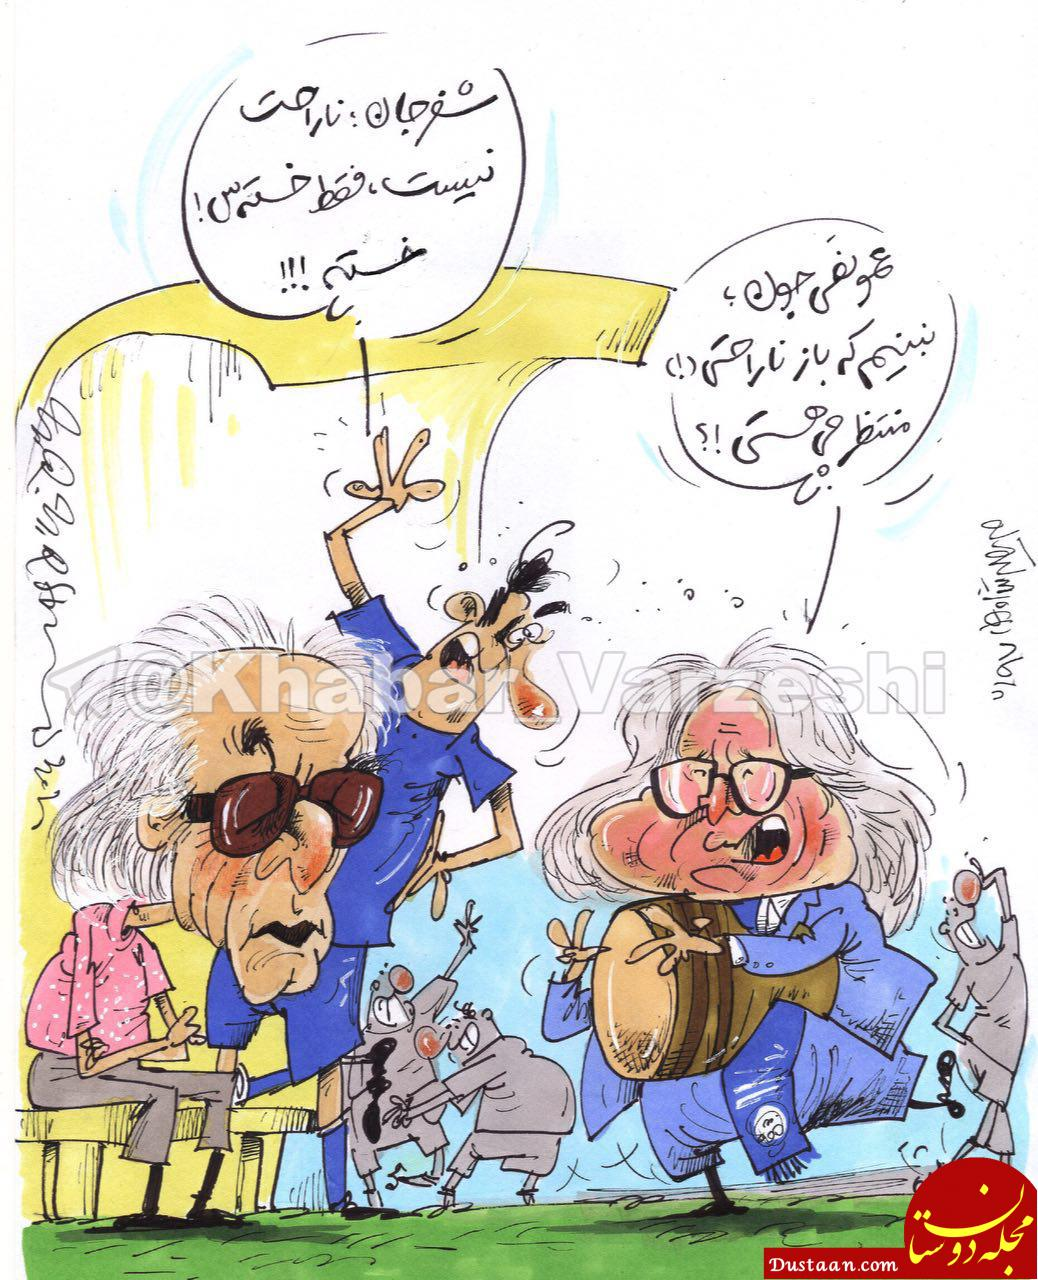 www.dustaan.com شفر: کسی حق ندارد روی نیمکت استقلال ناراحت بنشیند! +عکس